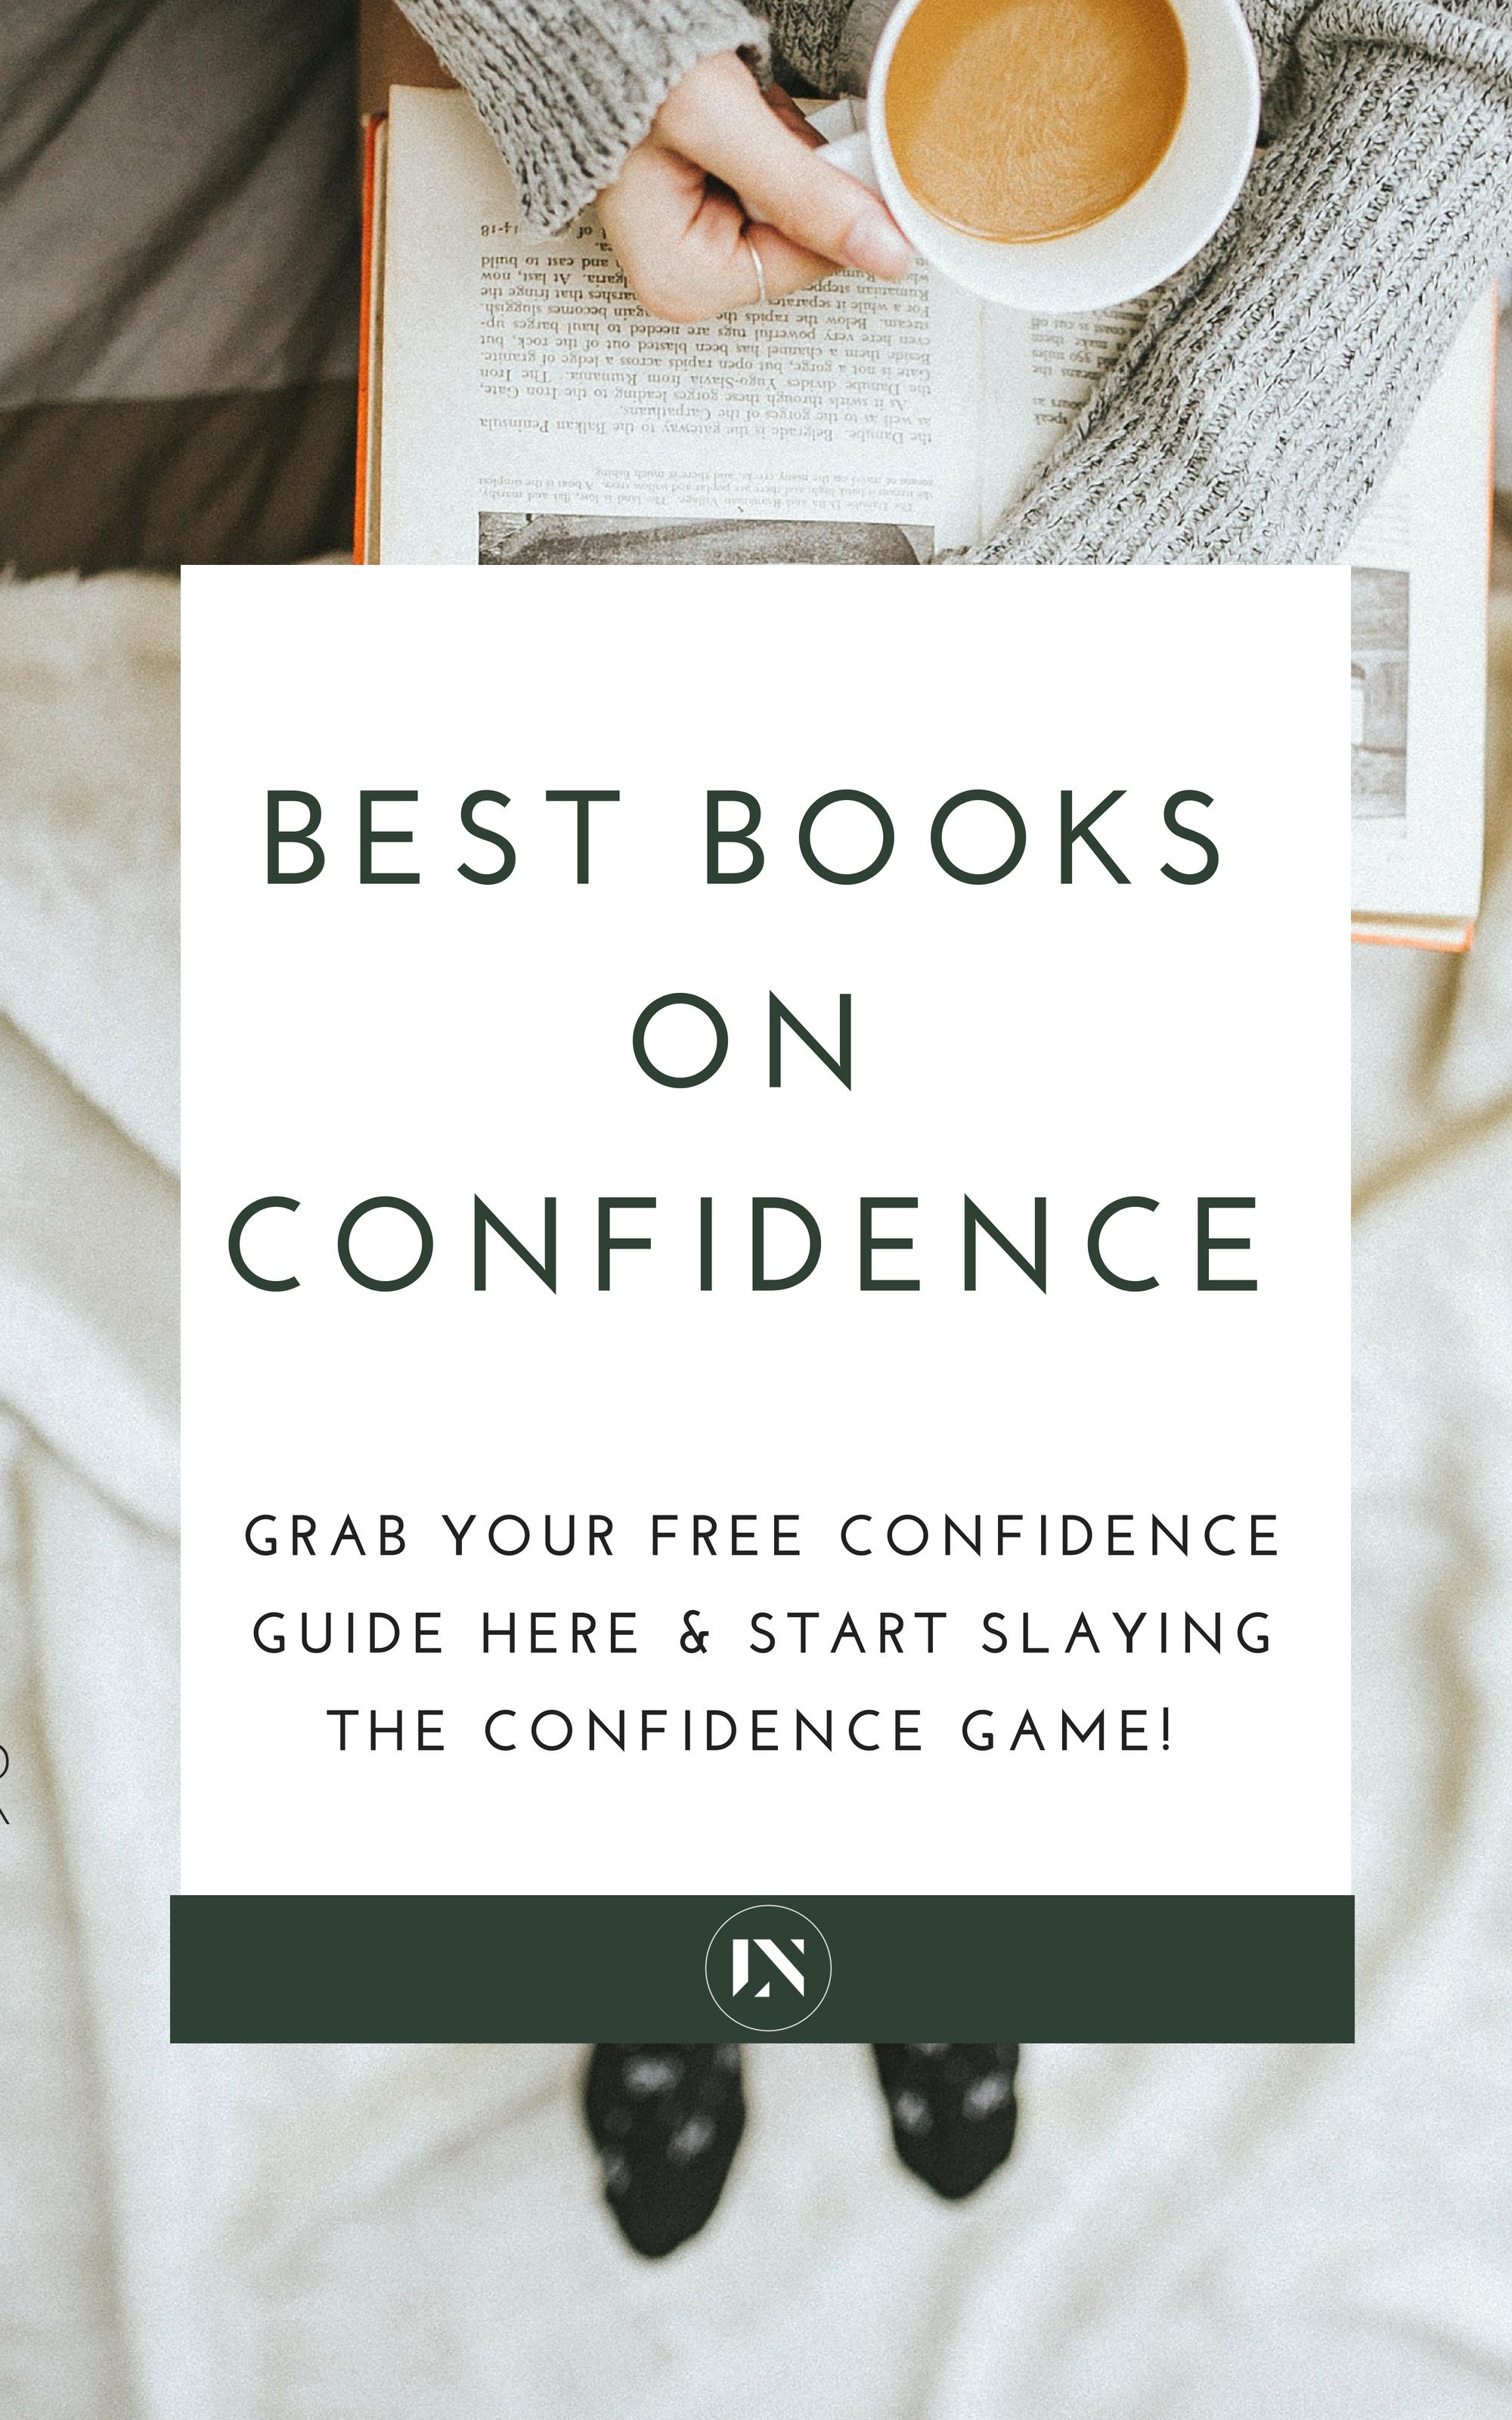 Best Books on Confidence